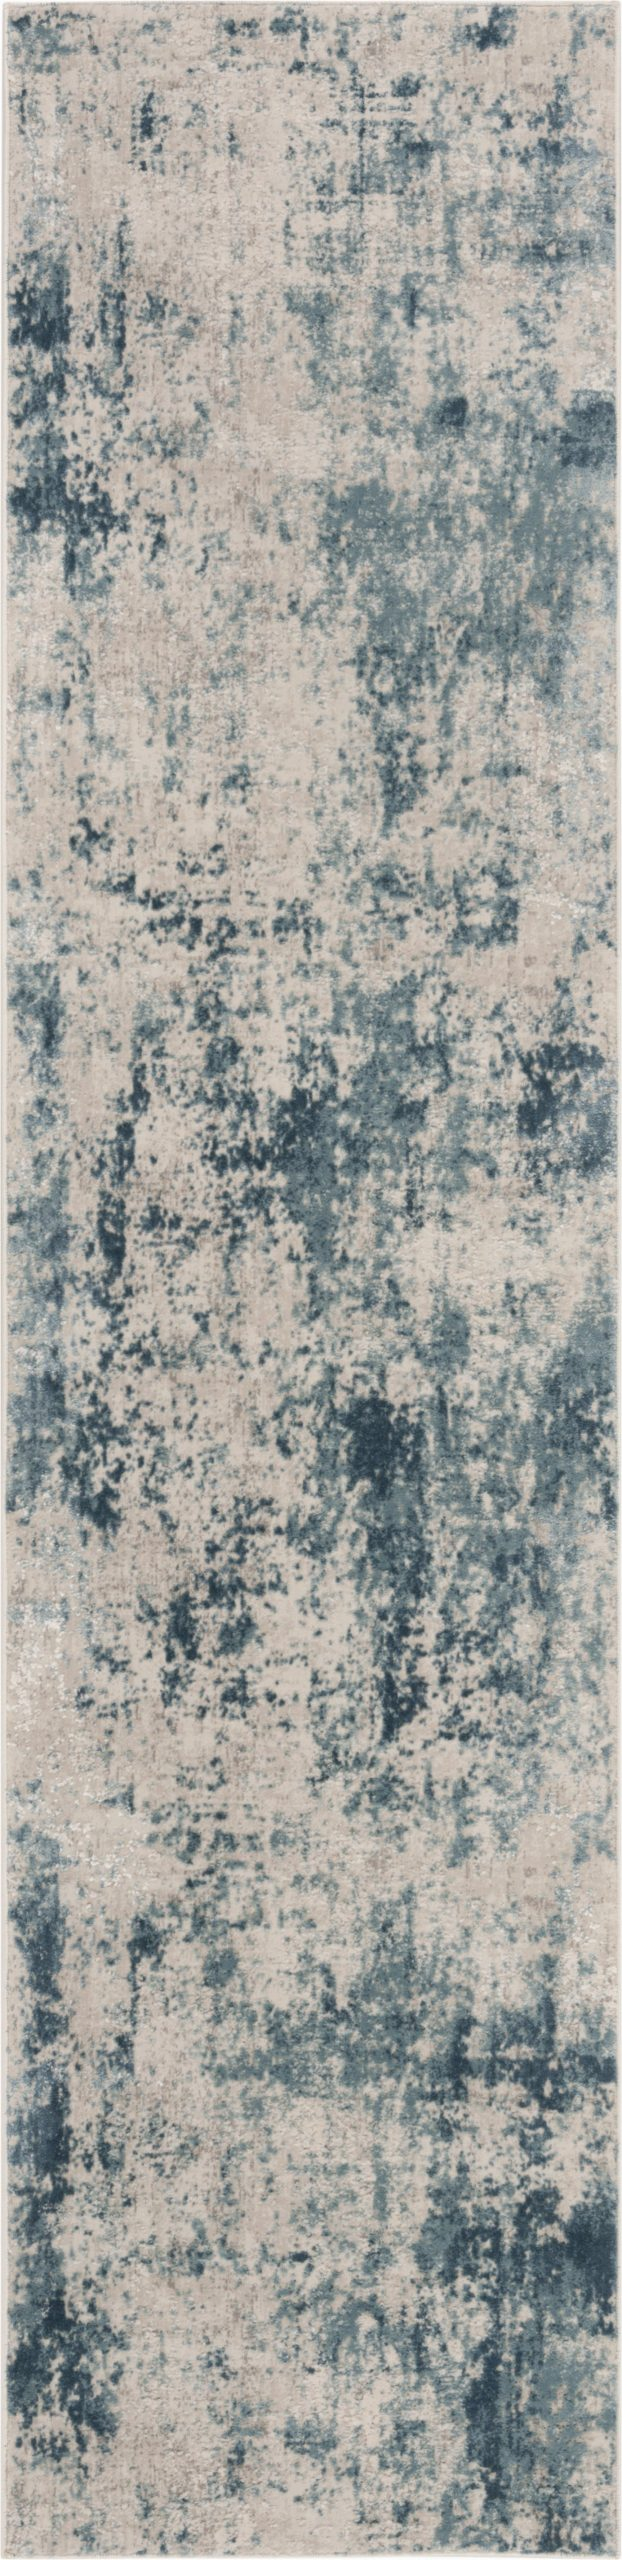 safavieh princeton prn716m blue beige area rug